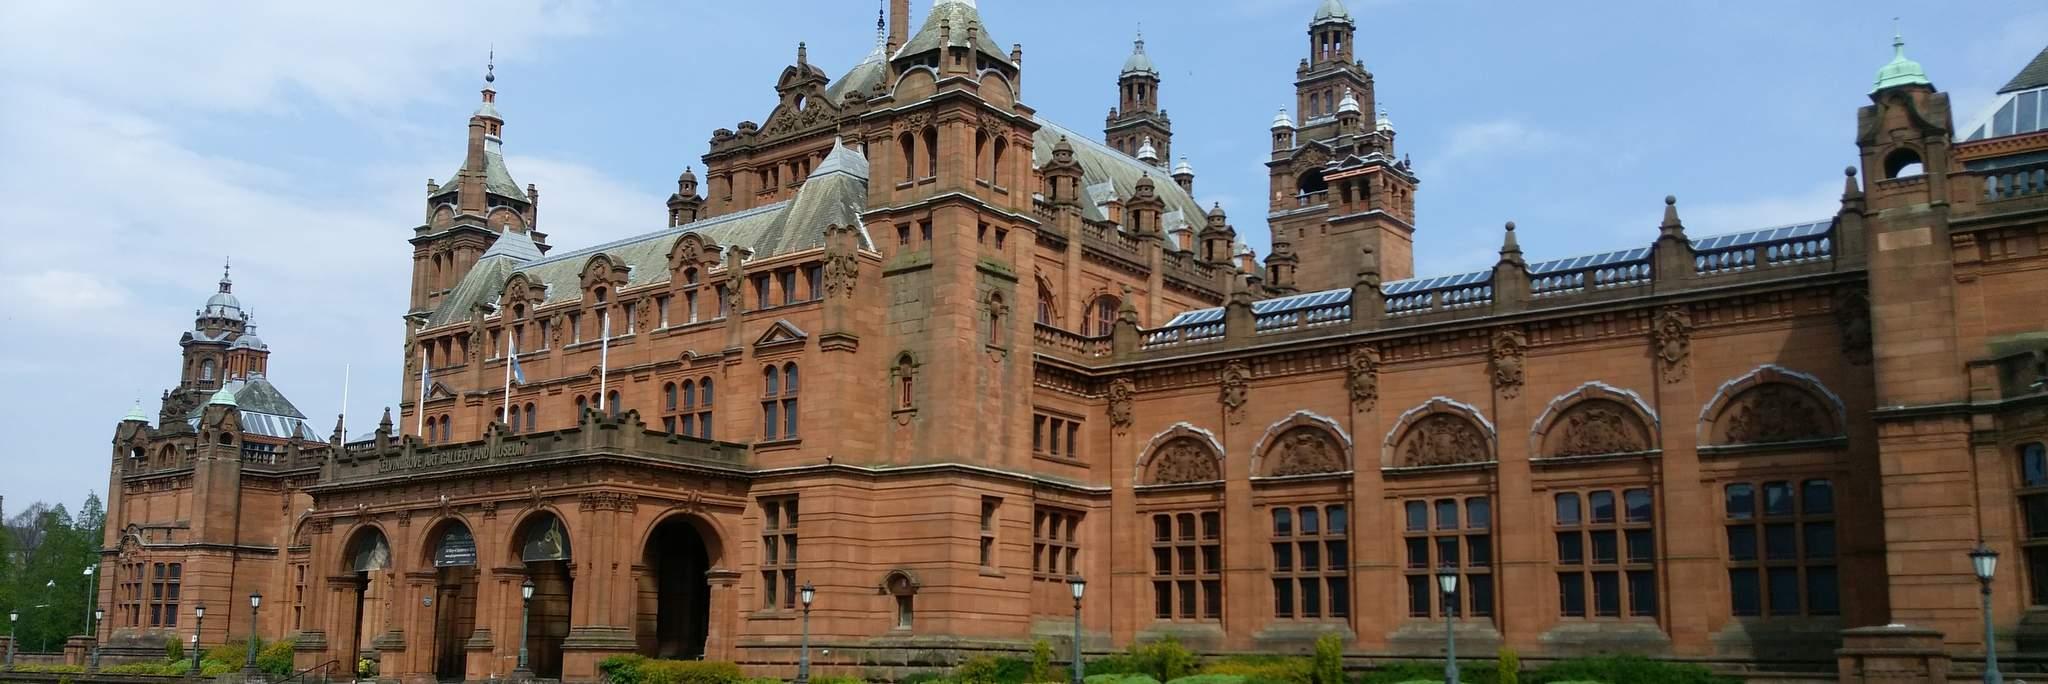 Scottish Museums: Scotland's Best B&Bs, 4 & 5 Star Accommodation